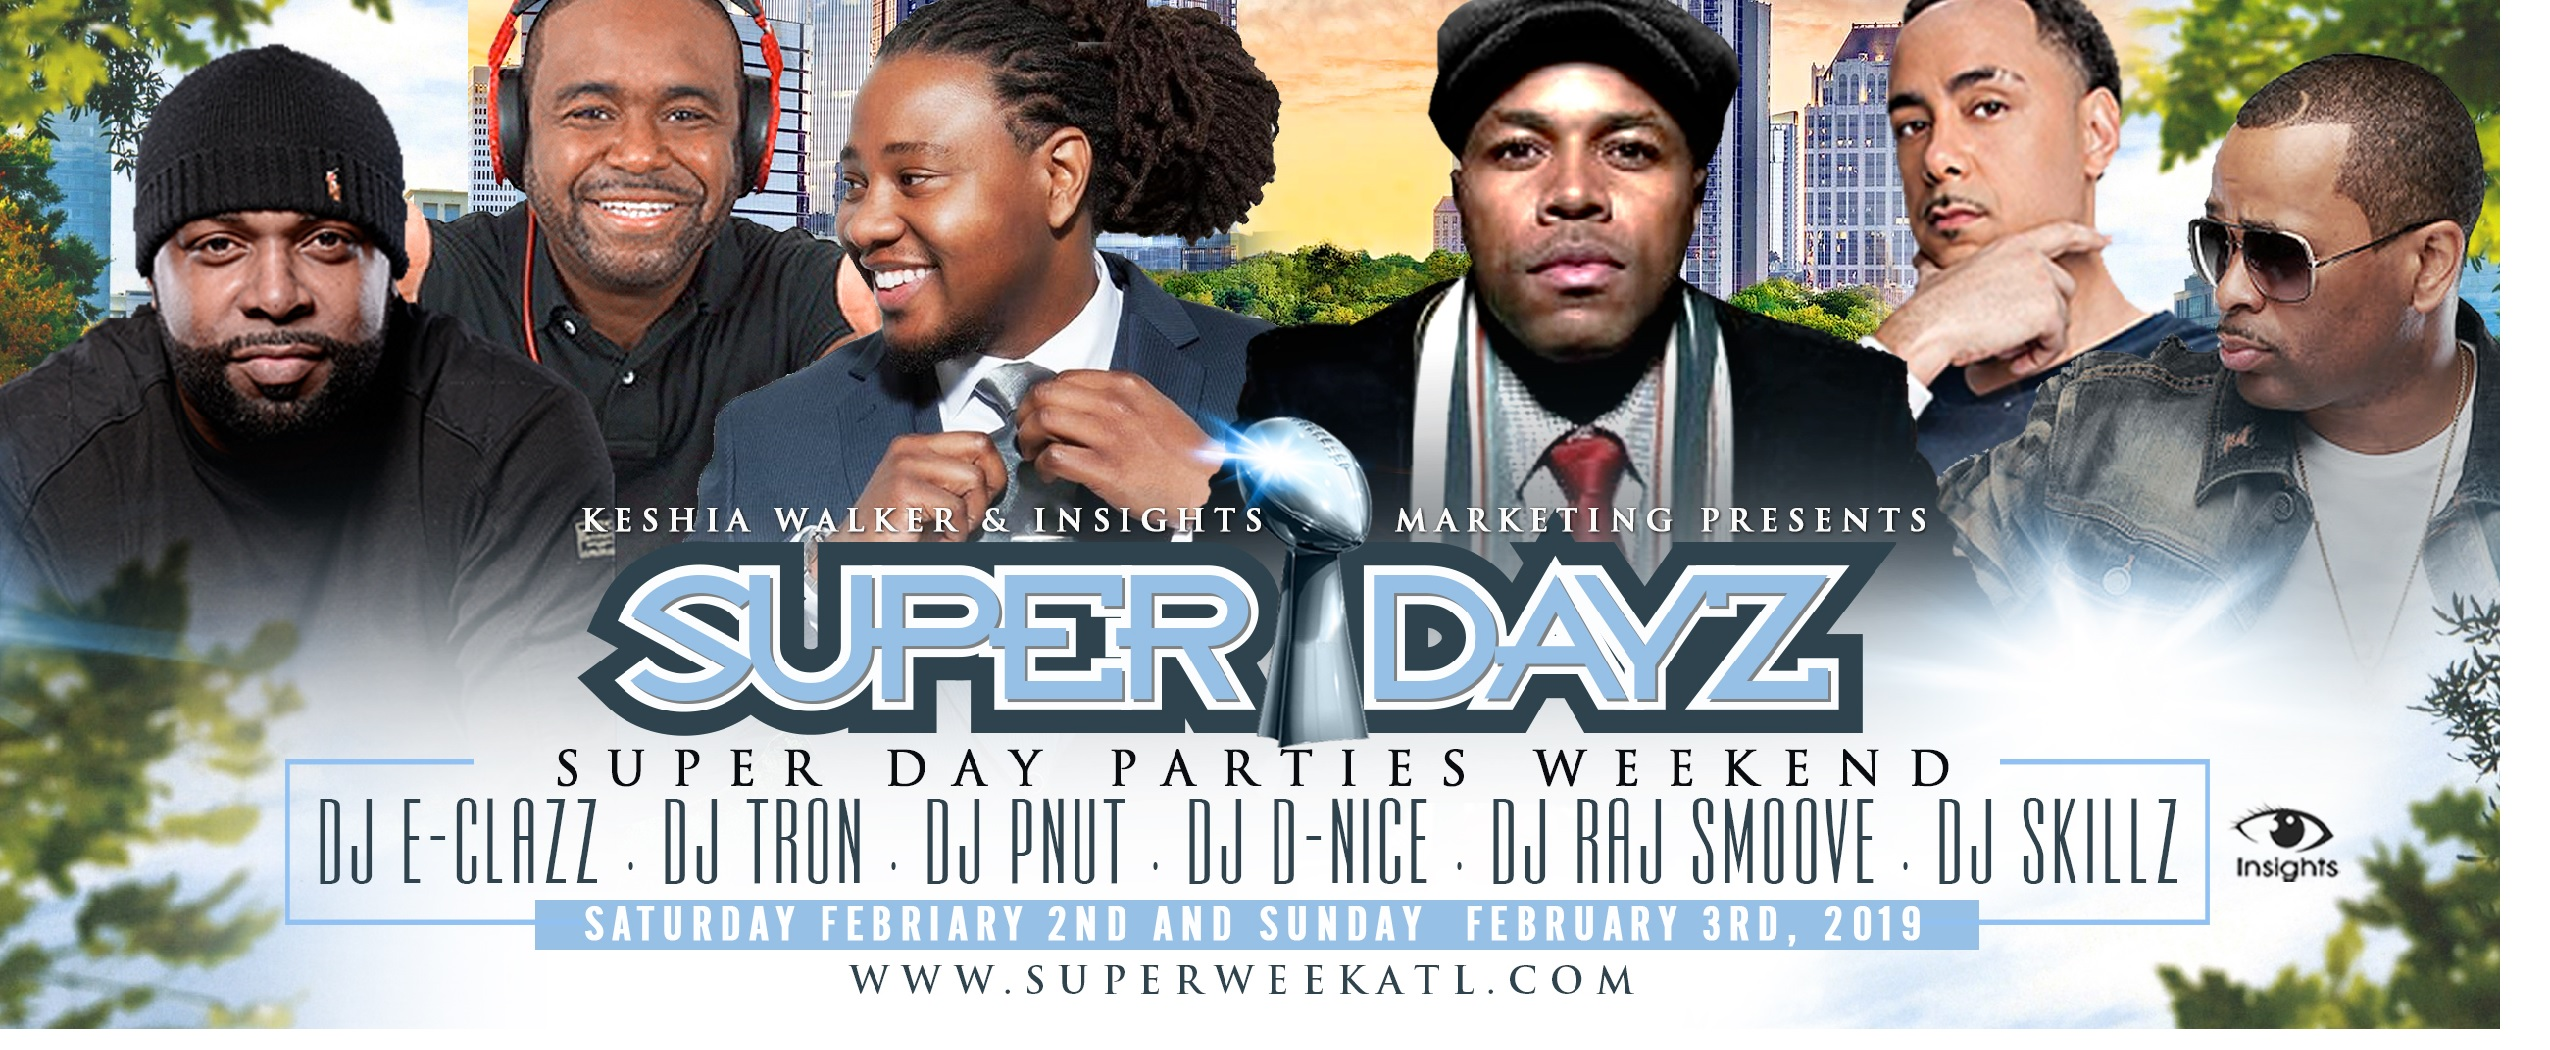 SuperDAYz Weekend of Events SuperBowl